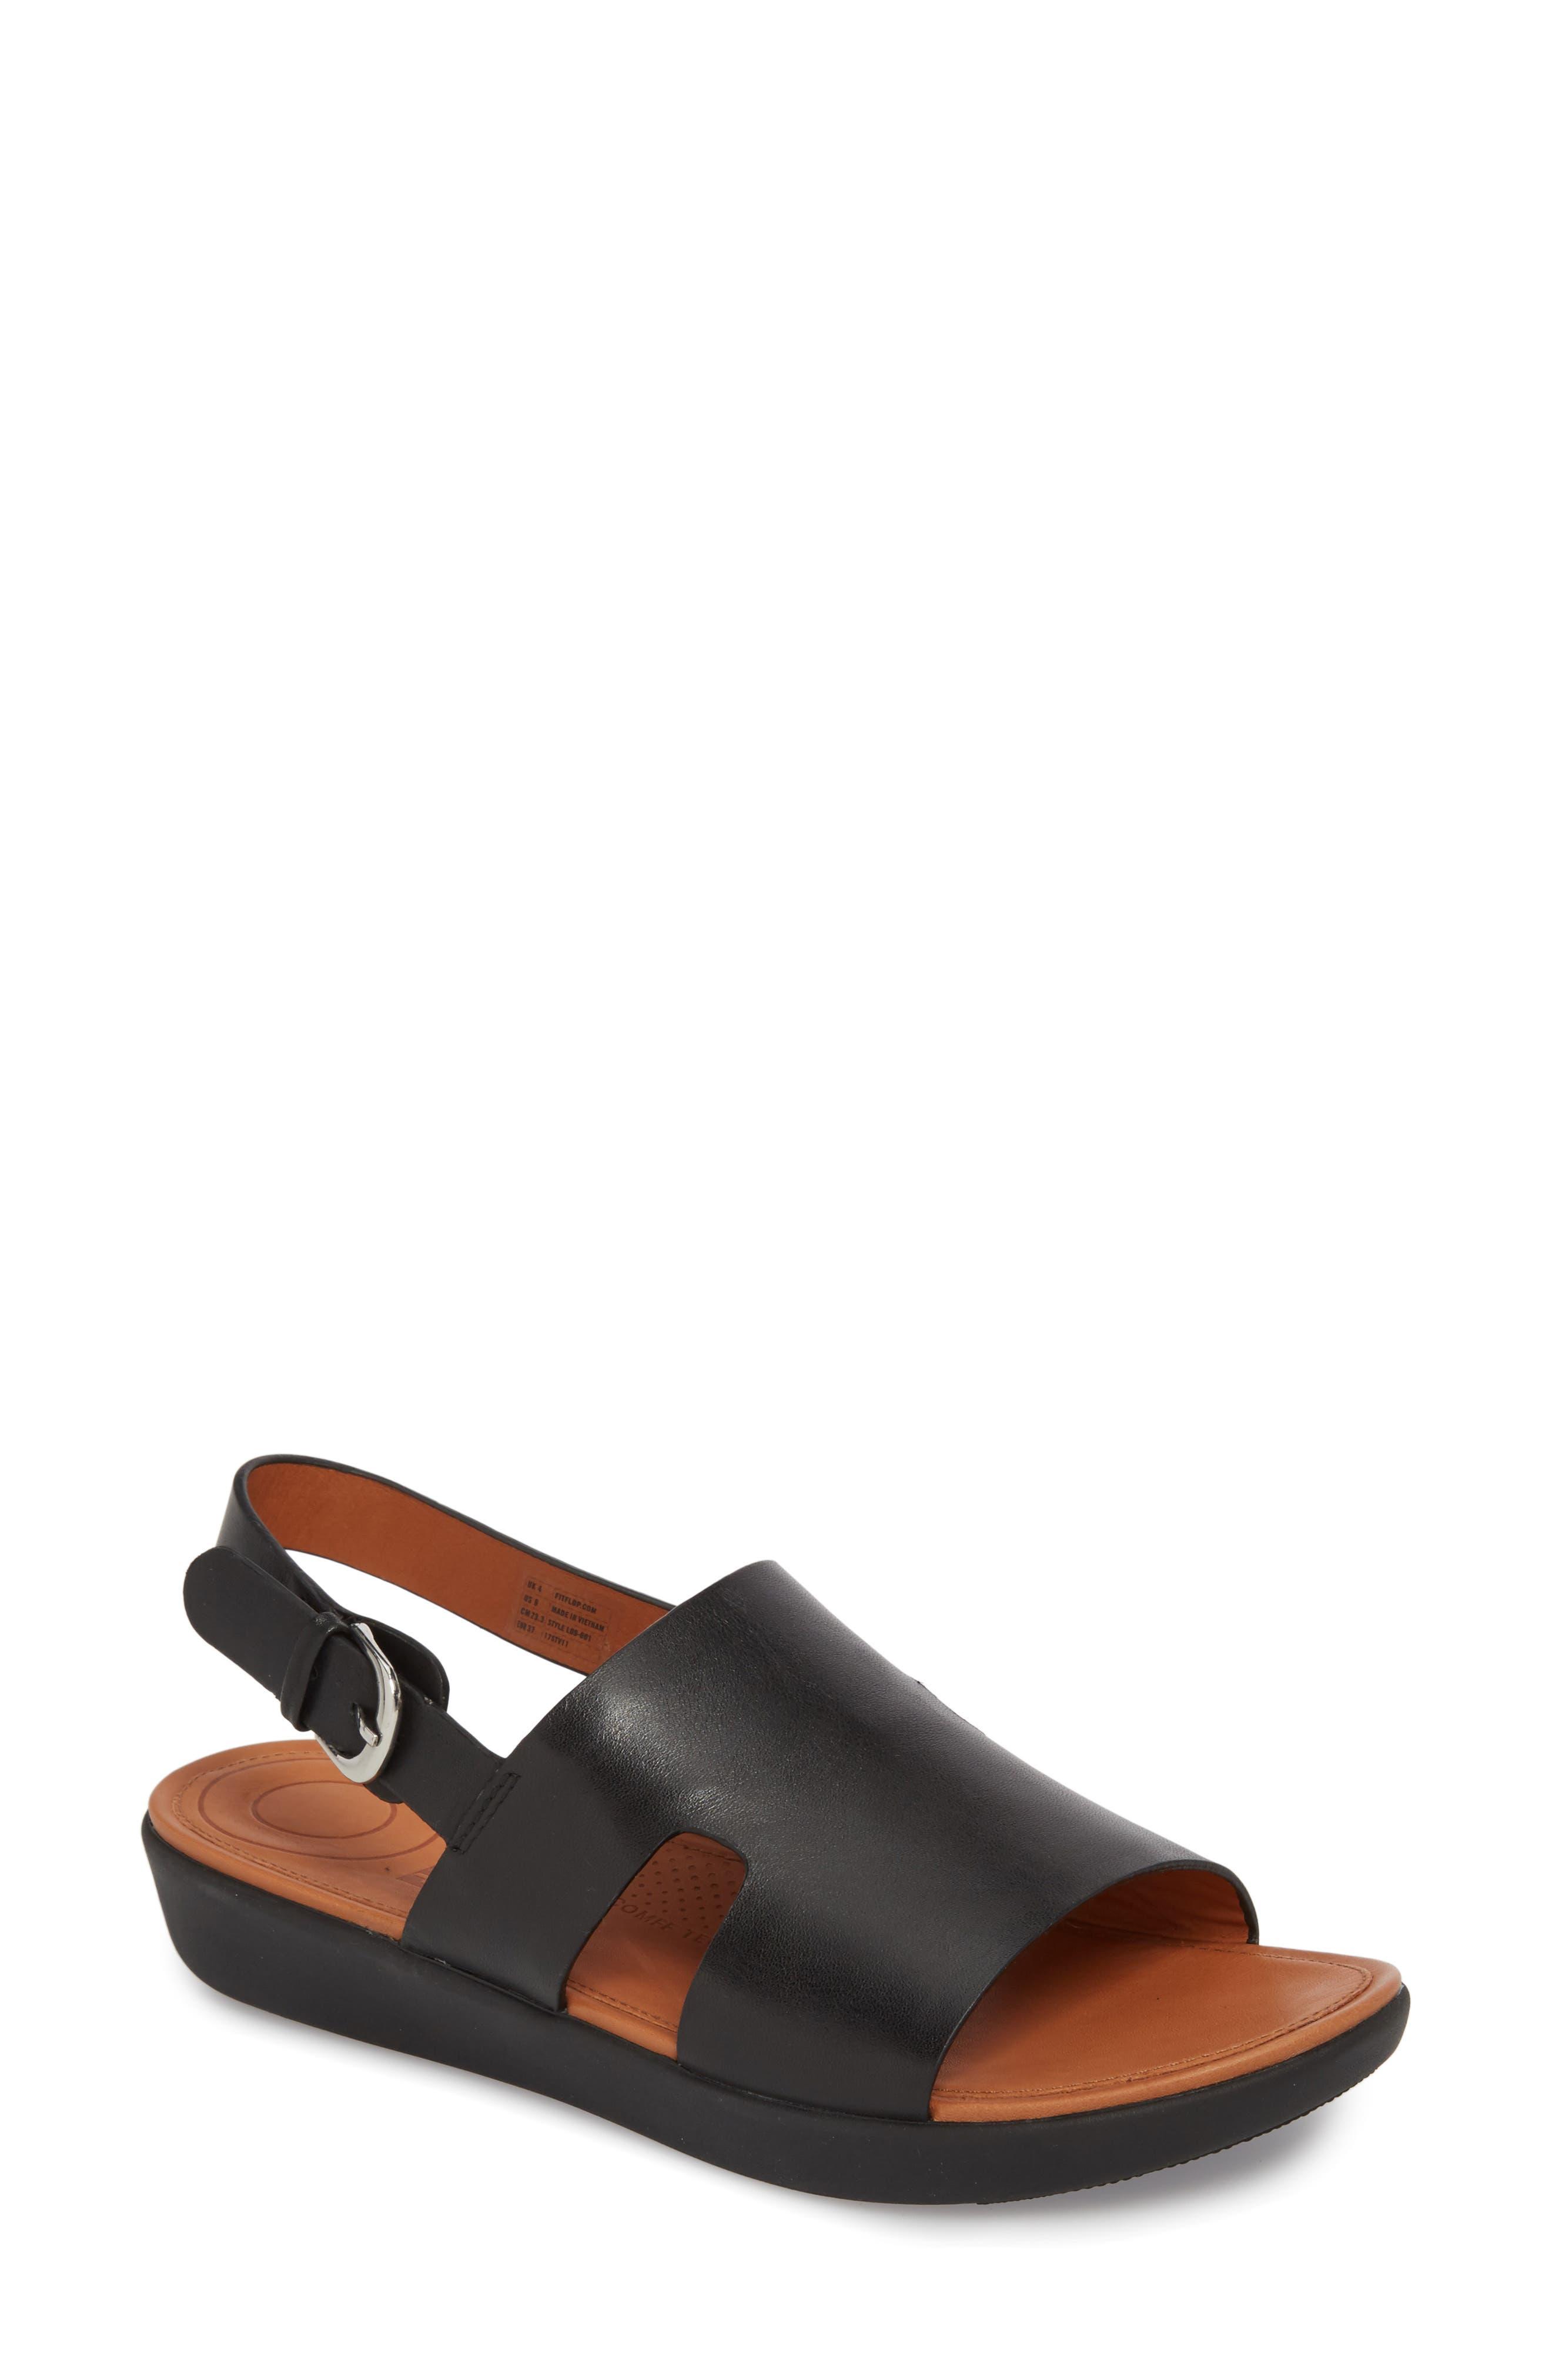 H-Bar Slingback Sandal,                         Main,                         color,